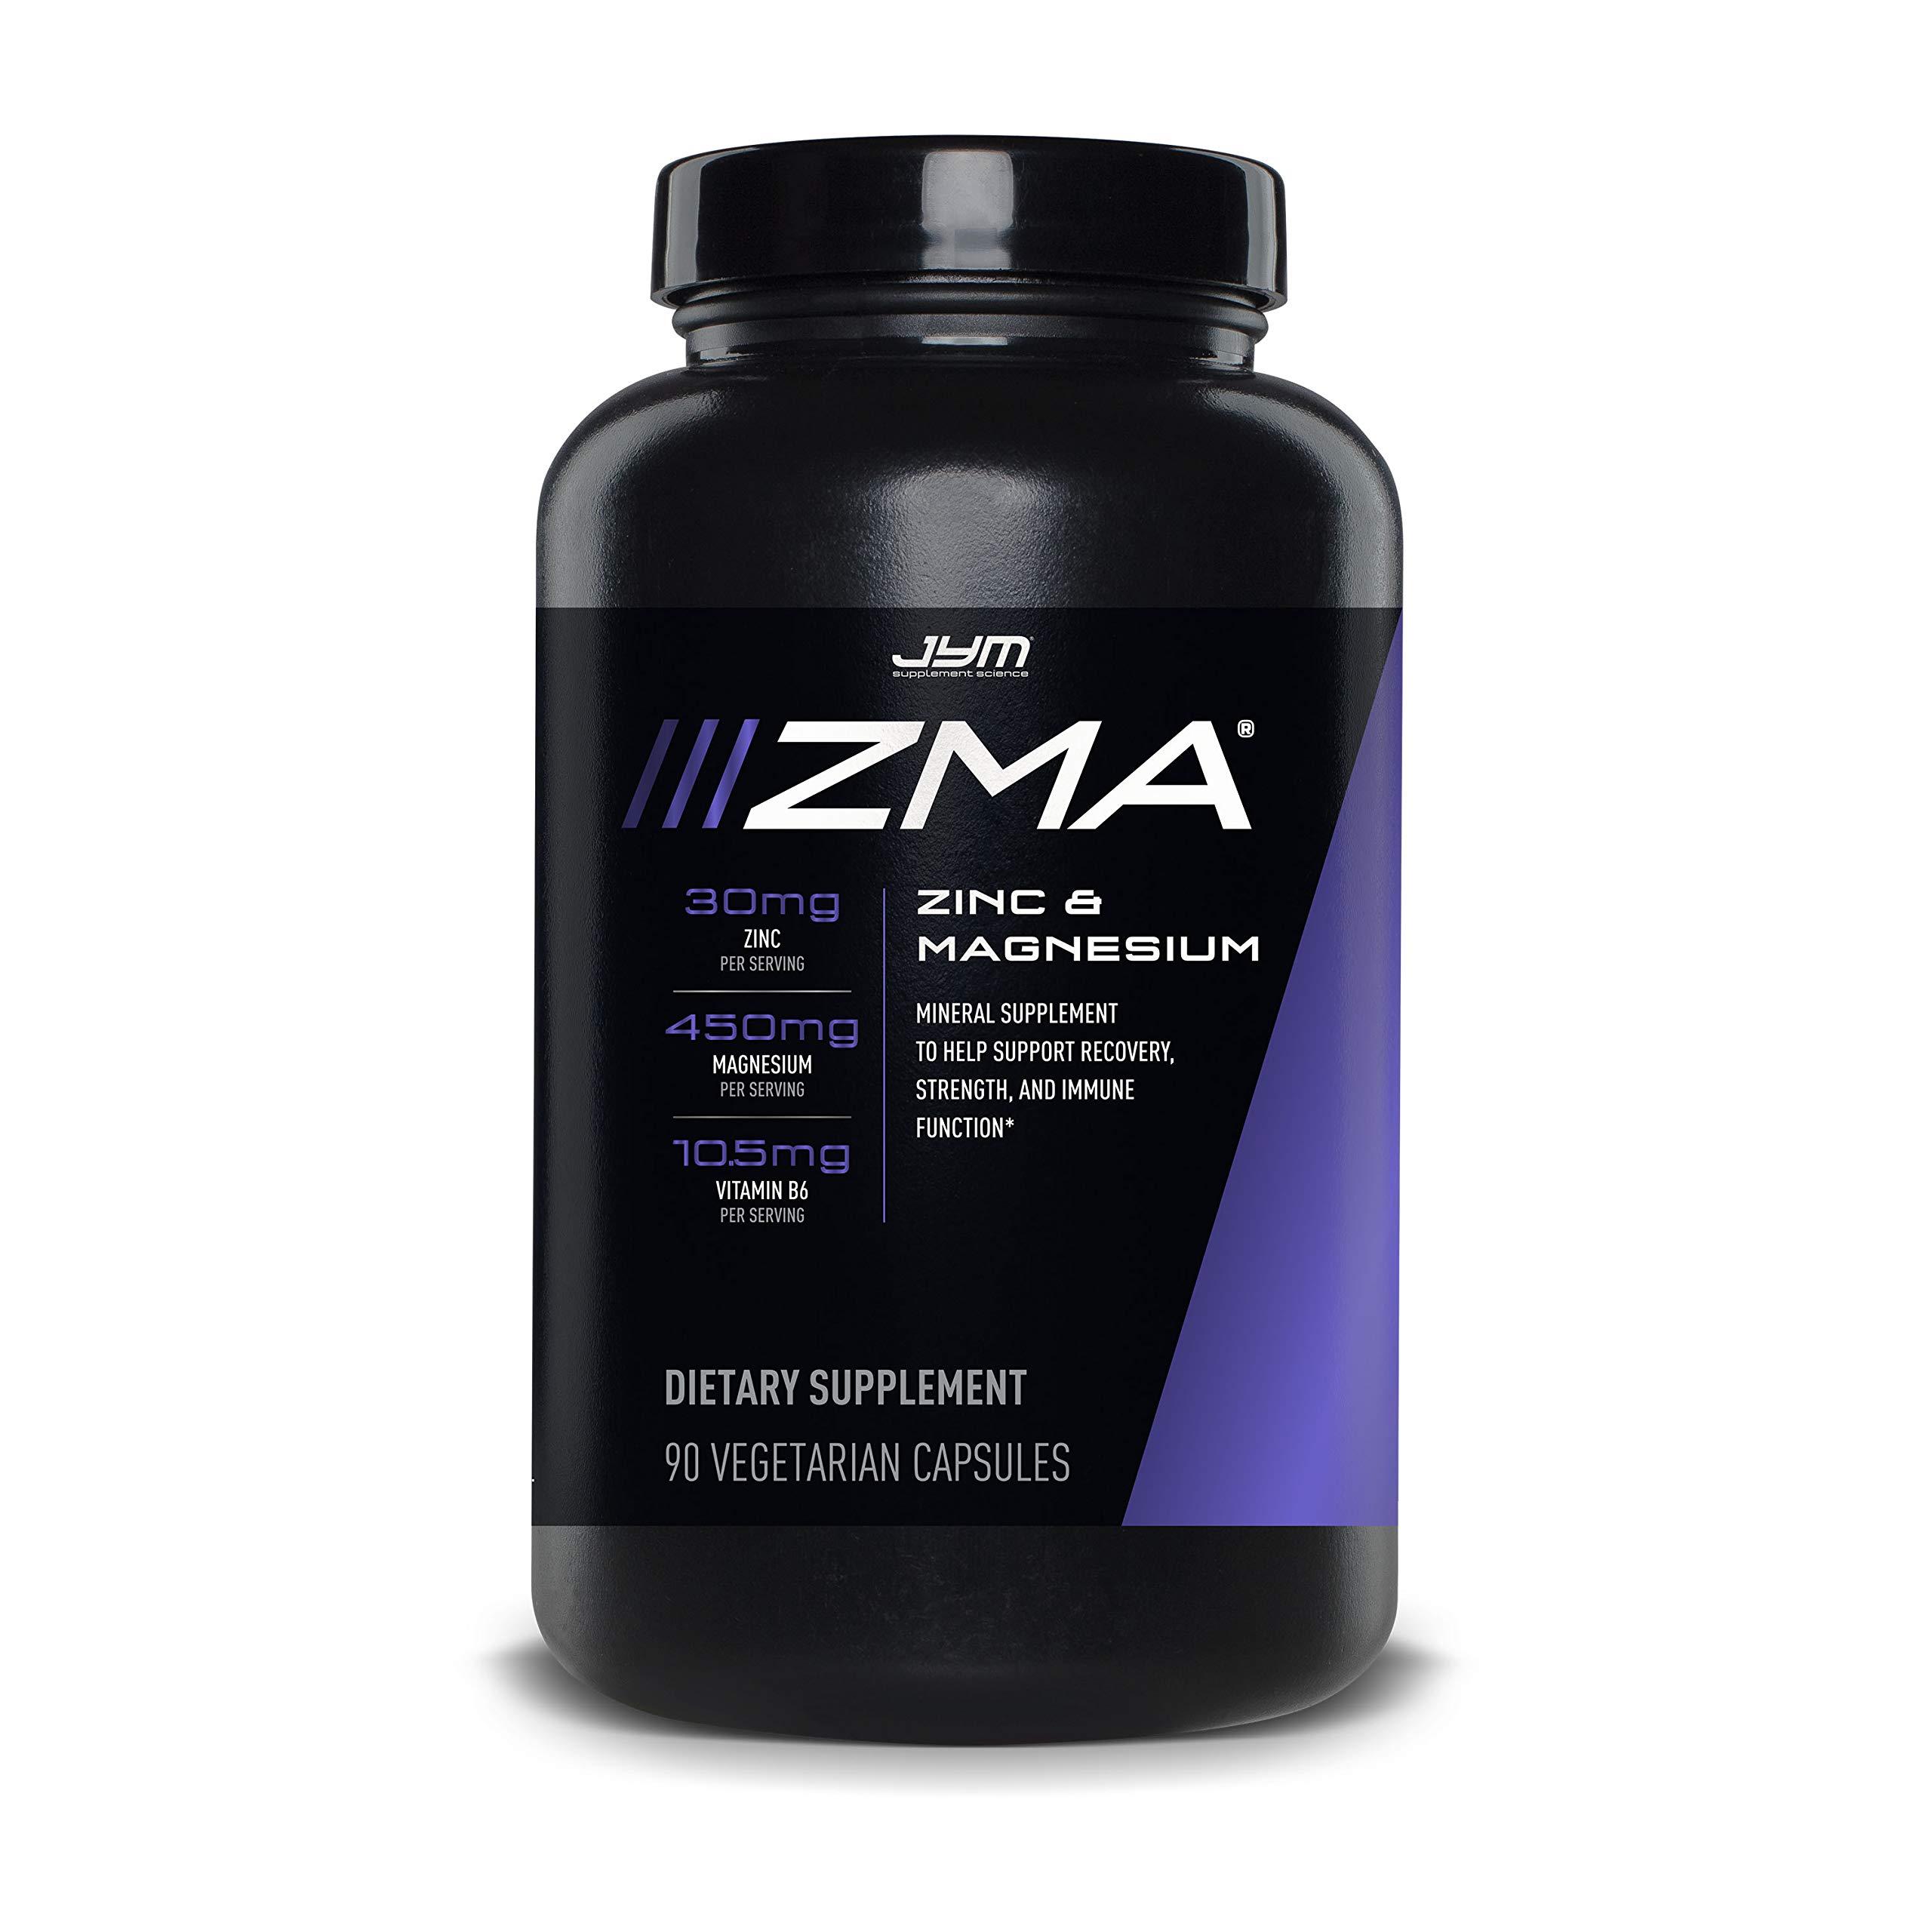 JYM Supplement Science ZMA Zinc/Magnesium Capsules Supplement - Zinc, Magnesium and Vitamin B6 | JYM Supplemental Science | 90 Vegetarian Capsules